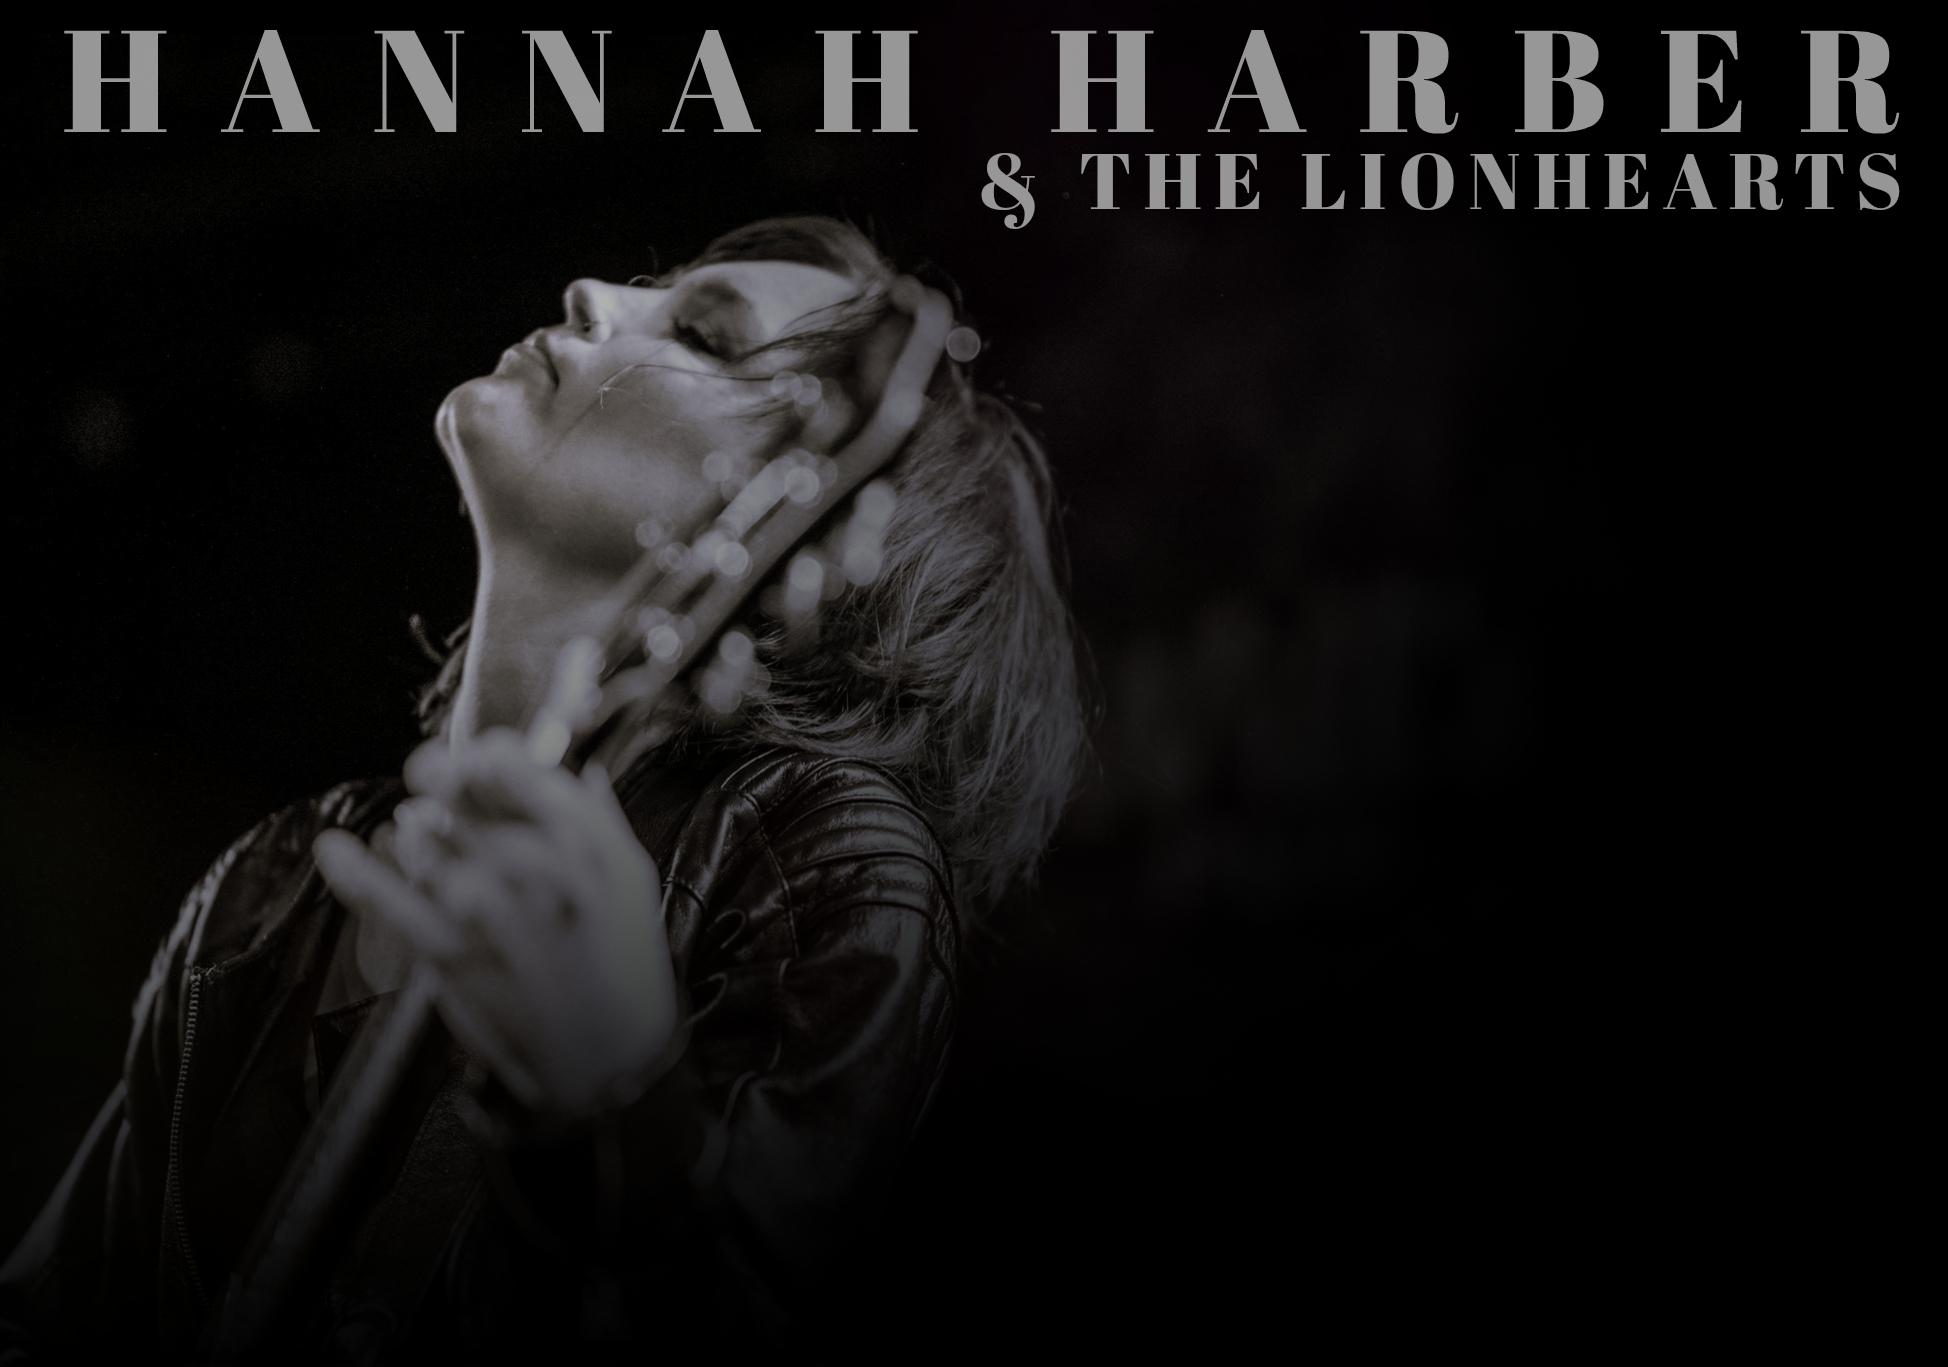 Hannah Harber - Hannah Harber & The Lionhearts